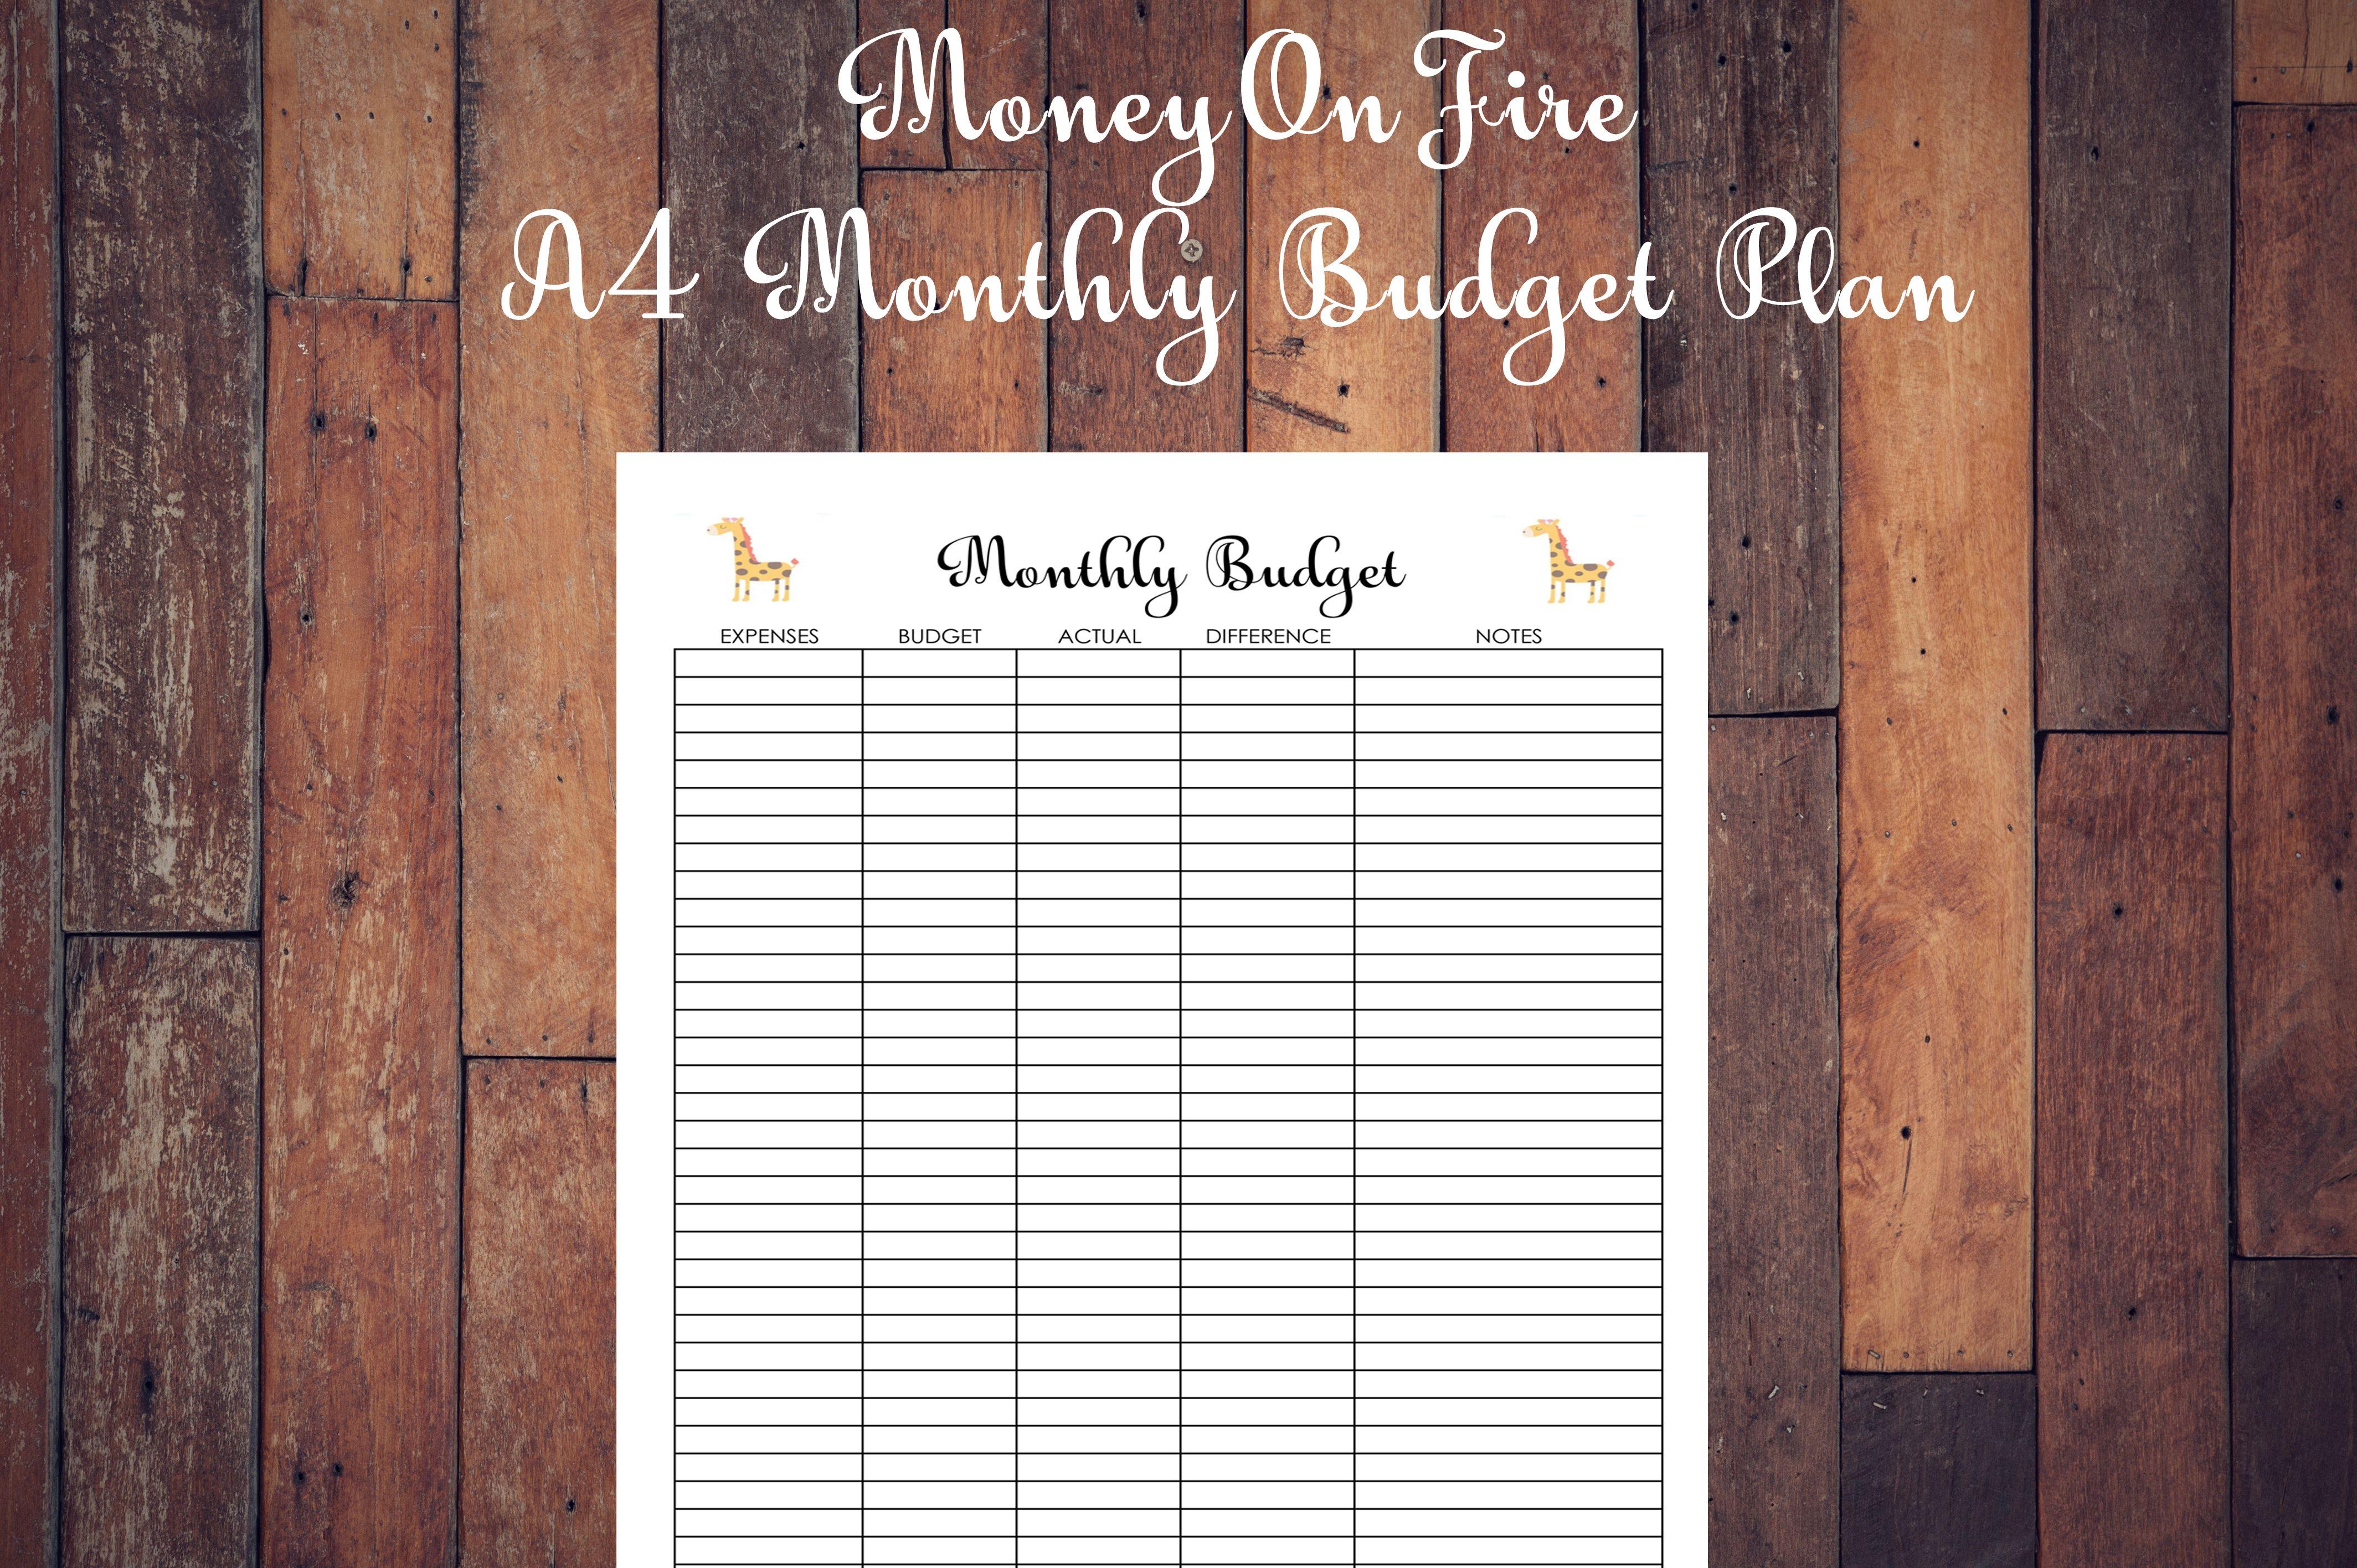 Monthly Budget Plan Printable Etsyshop Etsyseller